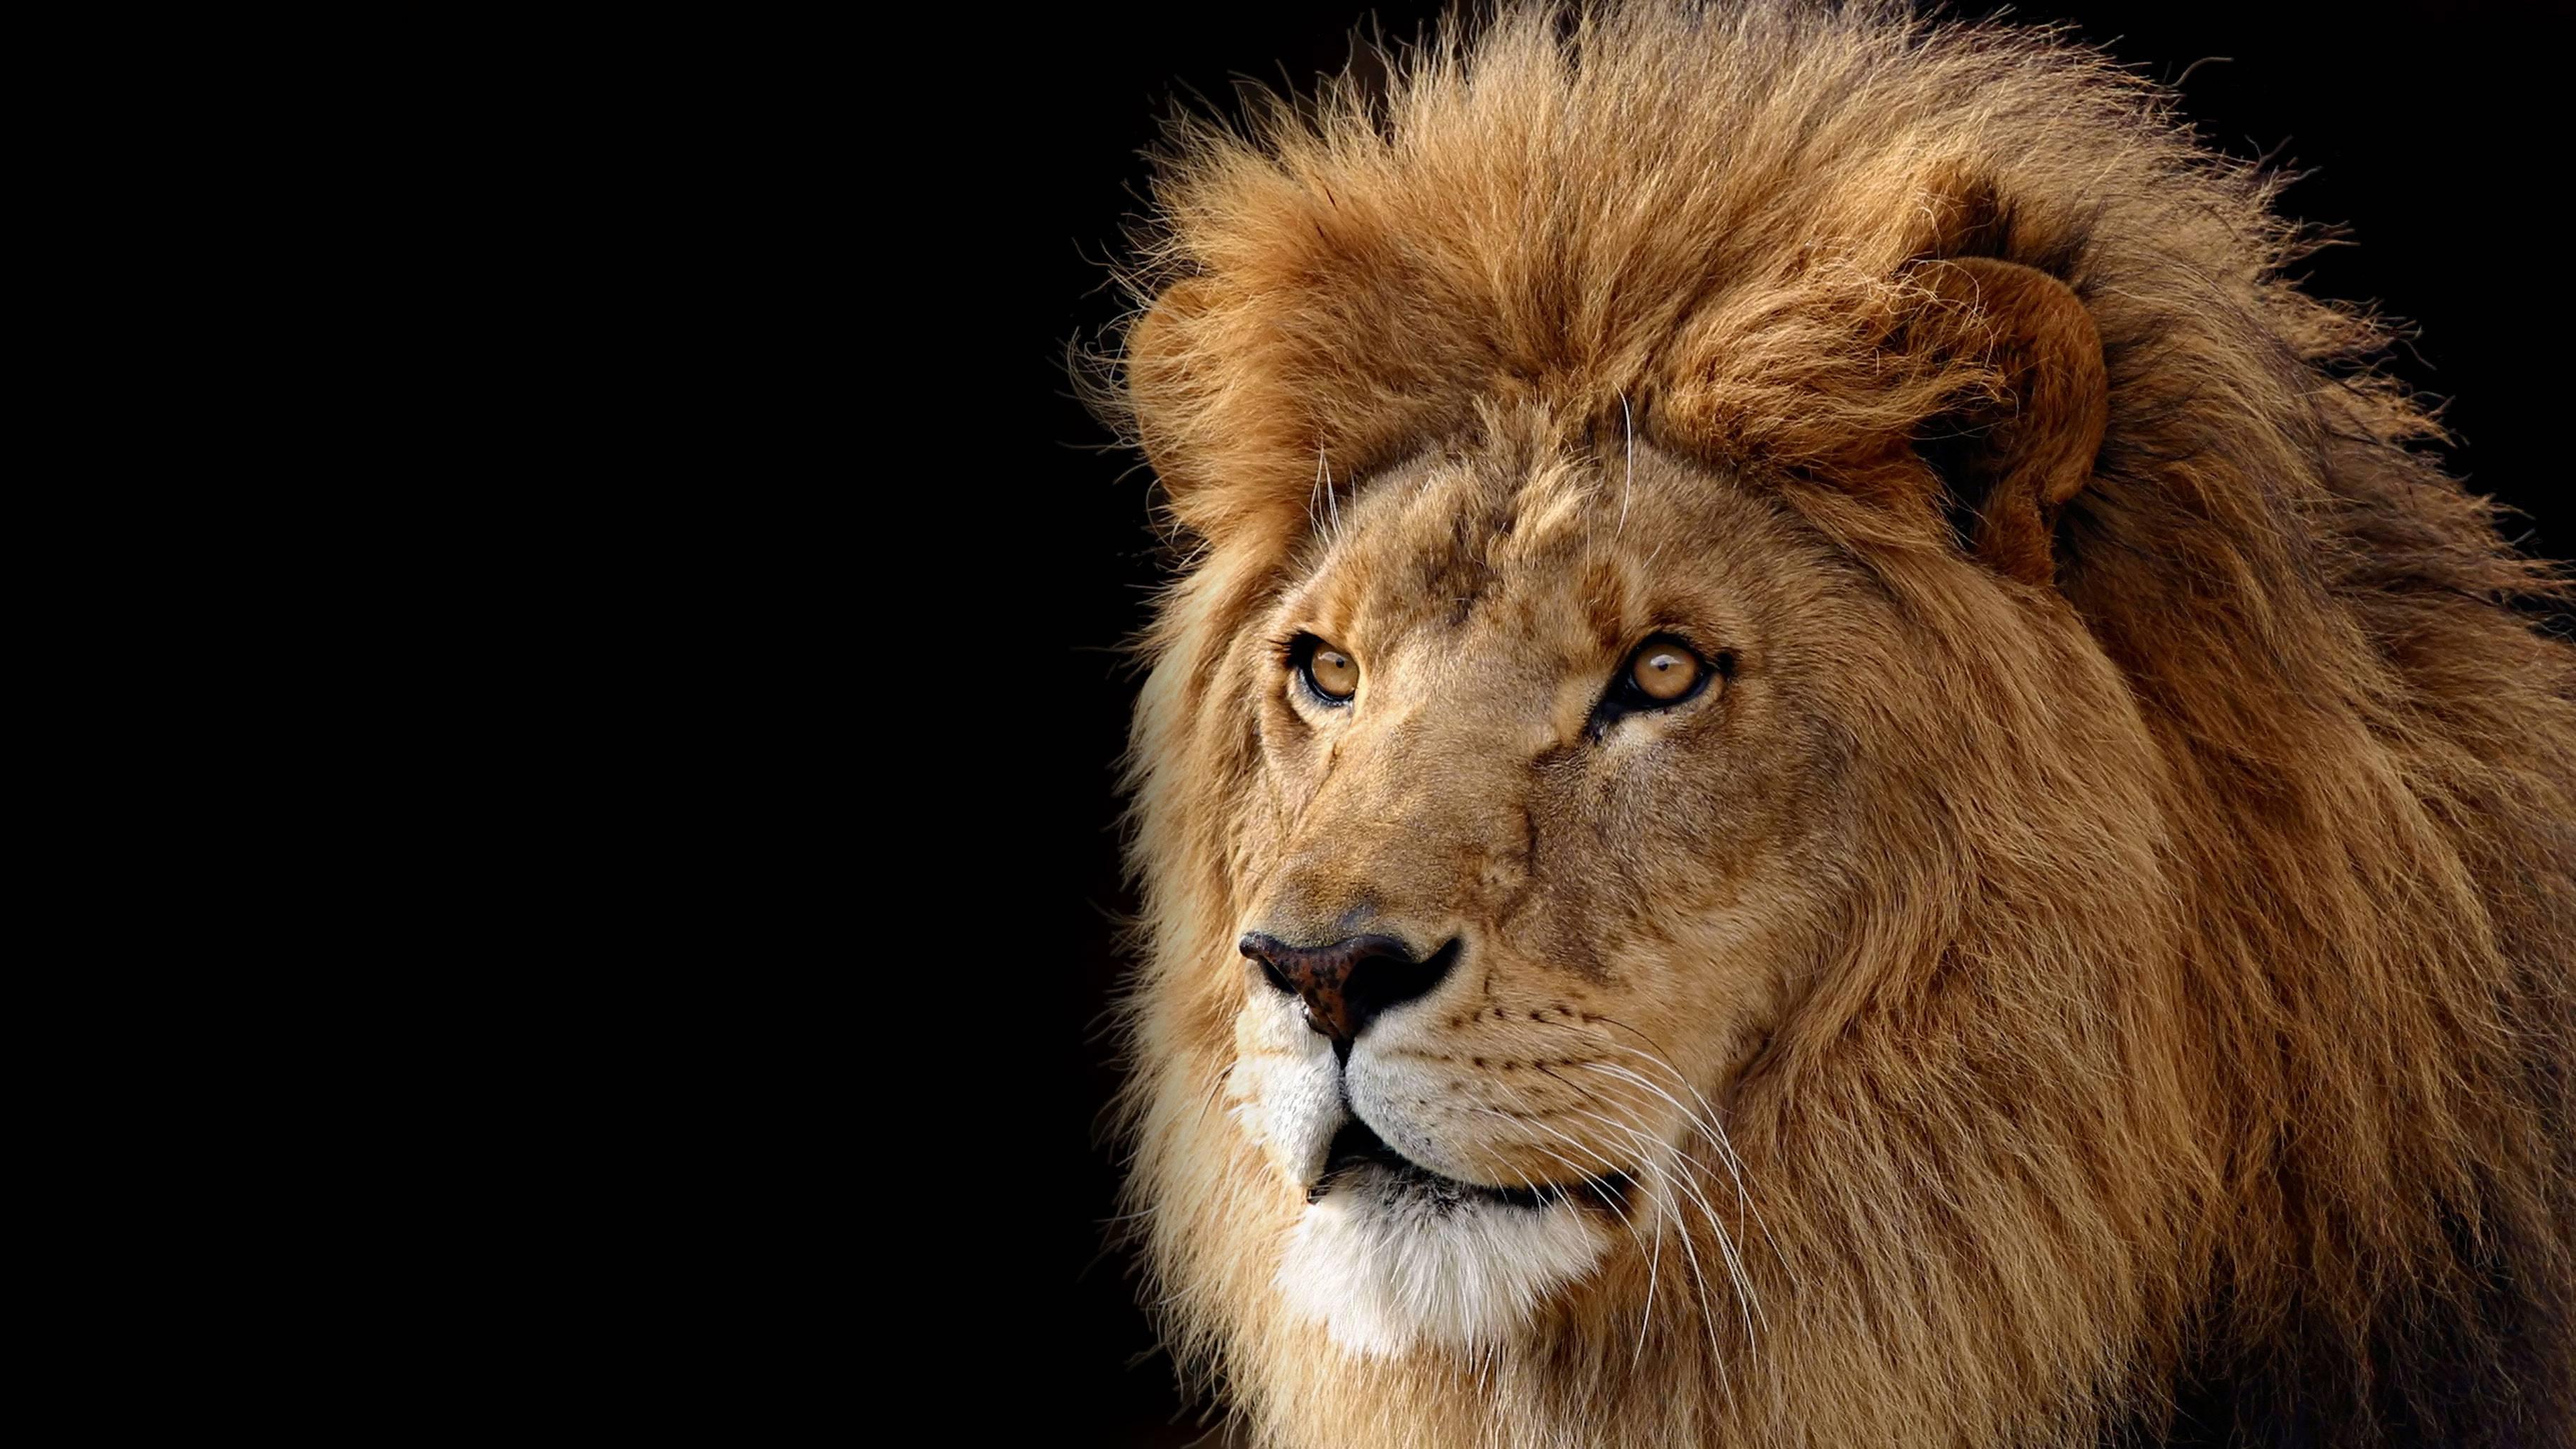 Lion Desktop Wallpapers Top Free Lion Desktop Backgrounds